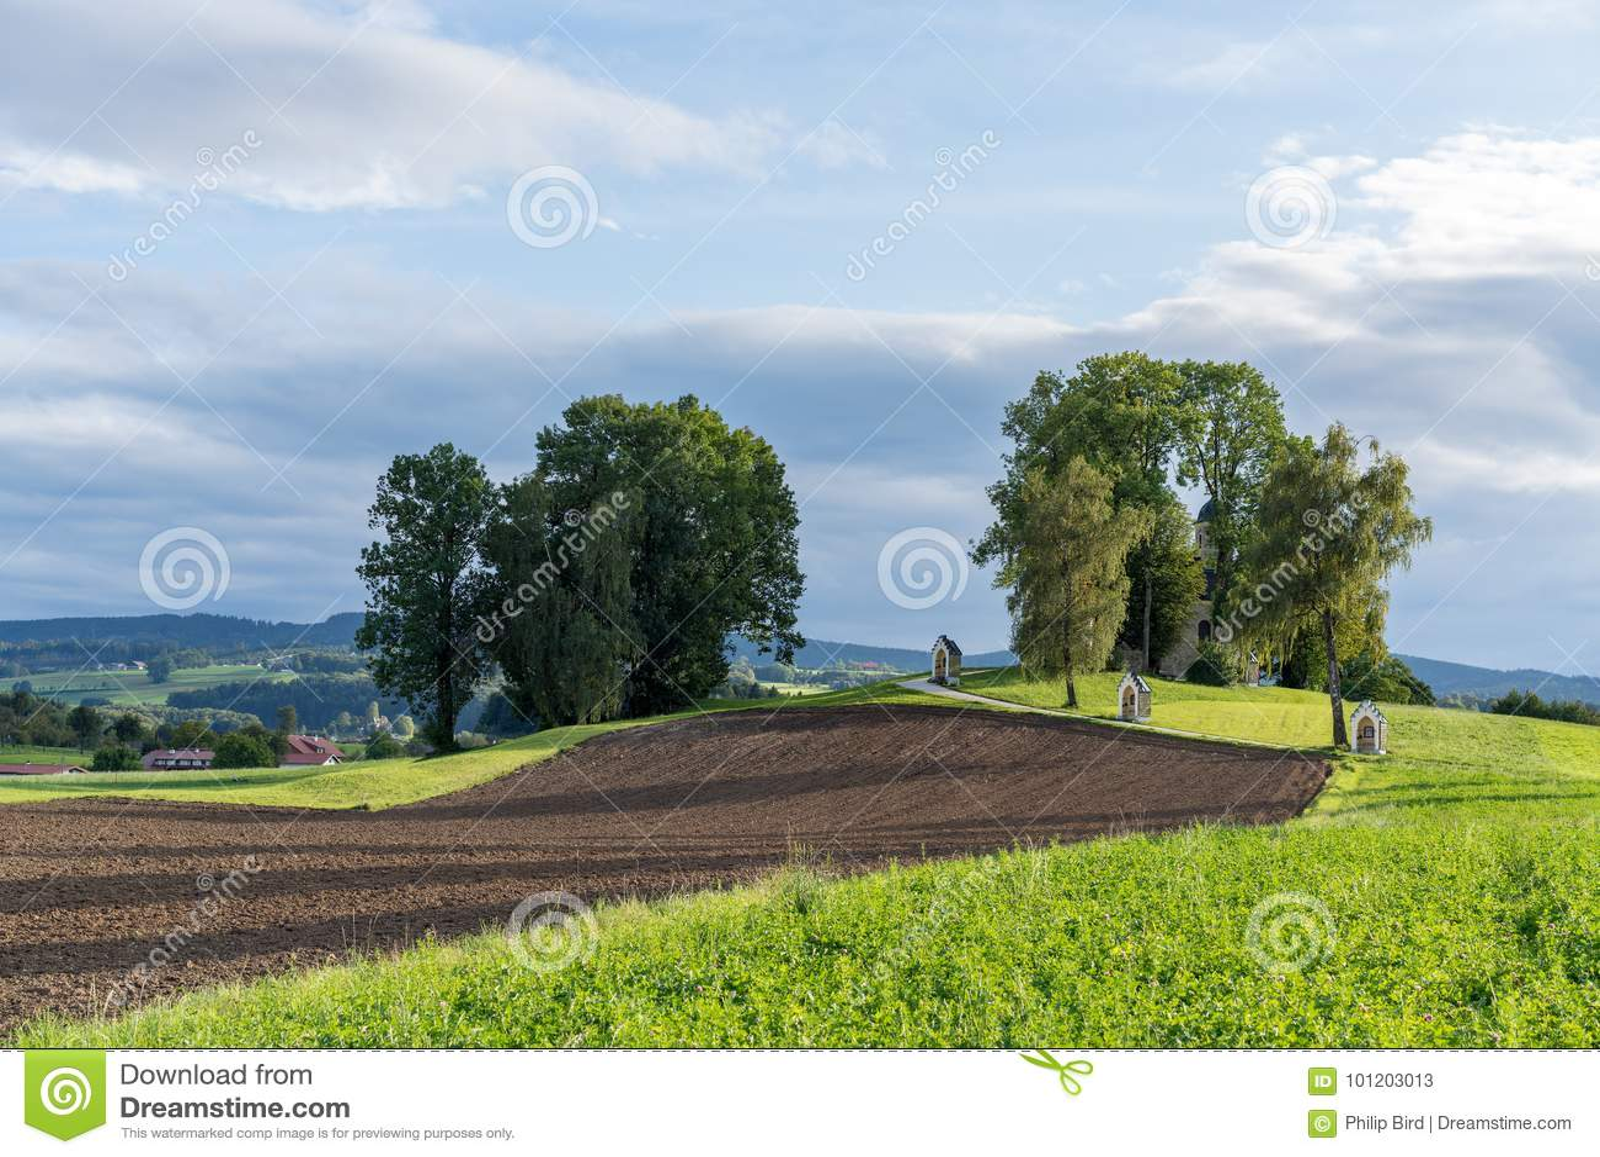 ST GEORGEN UPPER AUSTRIA /AUSTRIA - SEPTEMBER 15: Calvary Chur